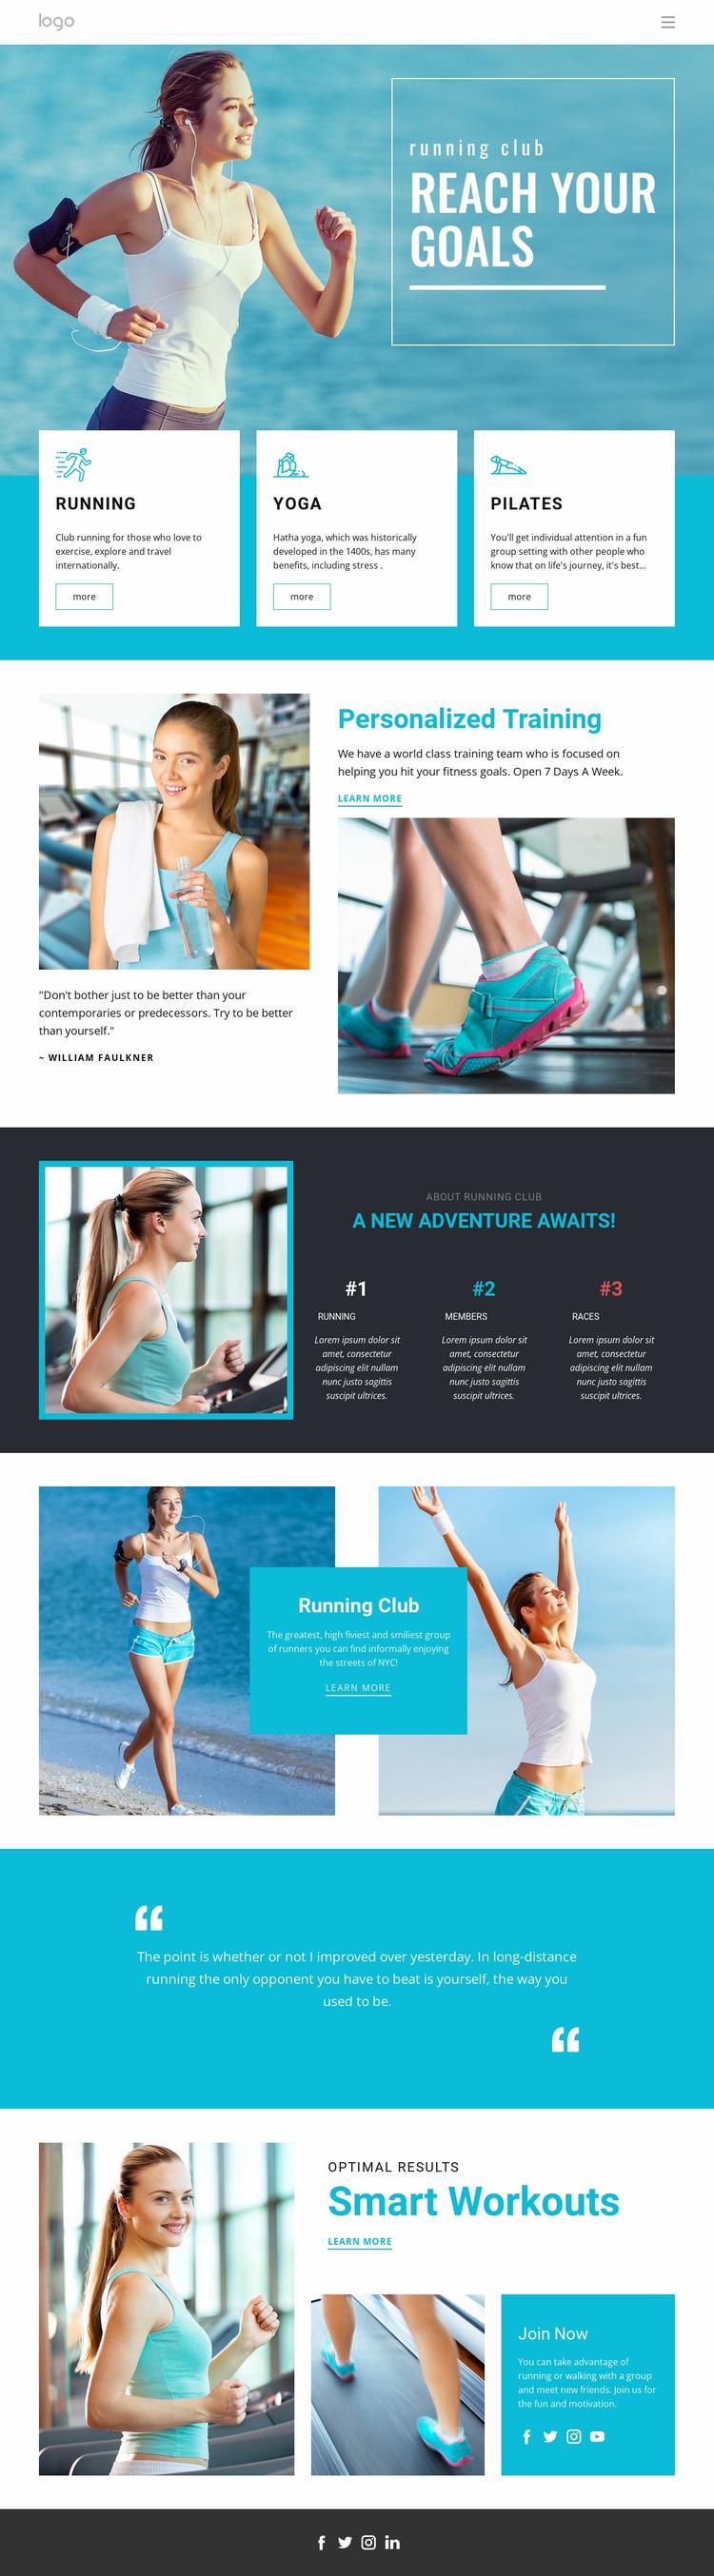 Reach Your Sport Goals Website Mockup